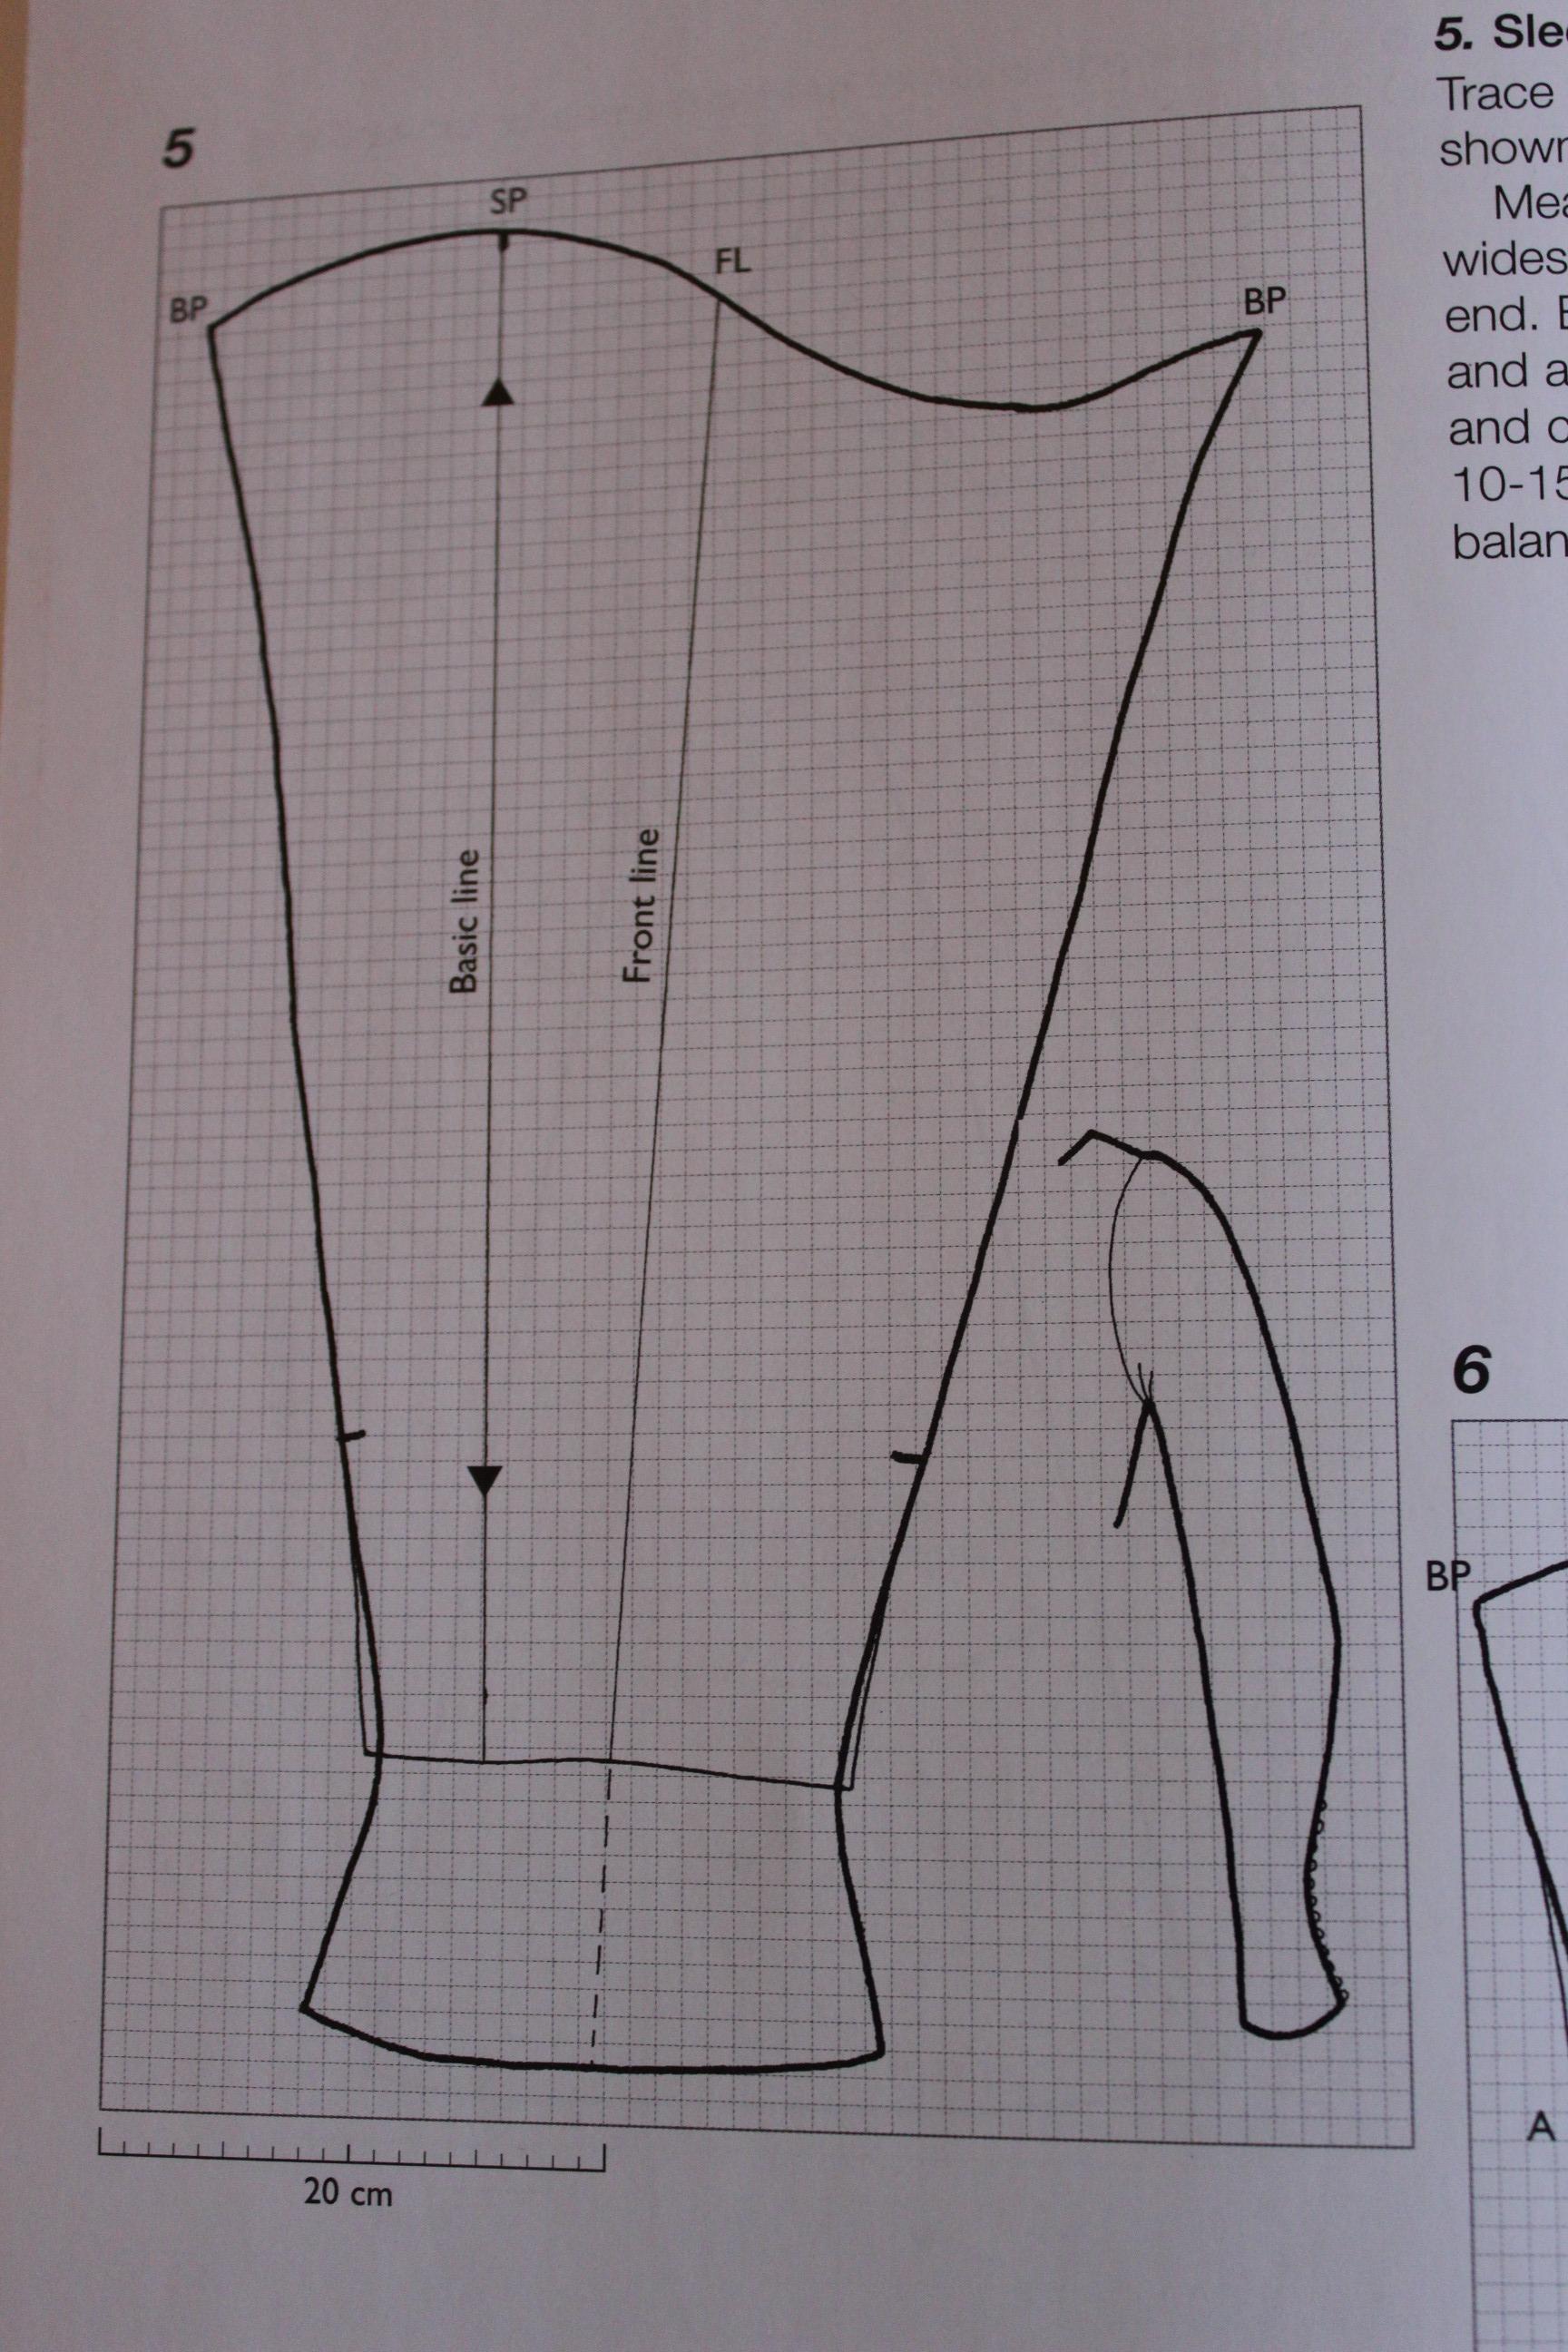 Shift Pattern Diagram By Damauk I Took A Photo Of The Shift Diagram